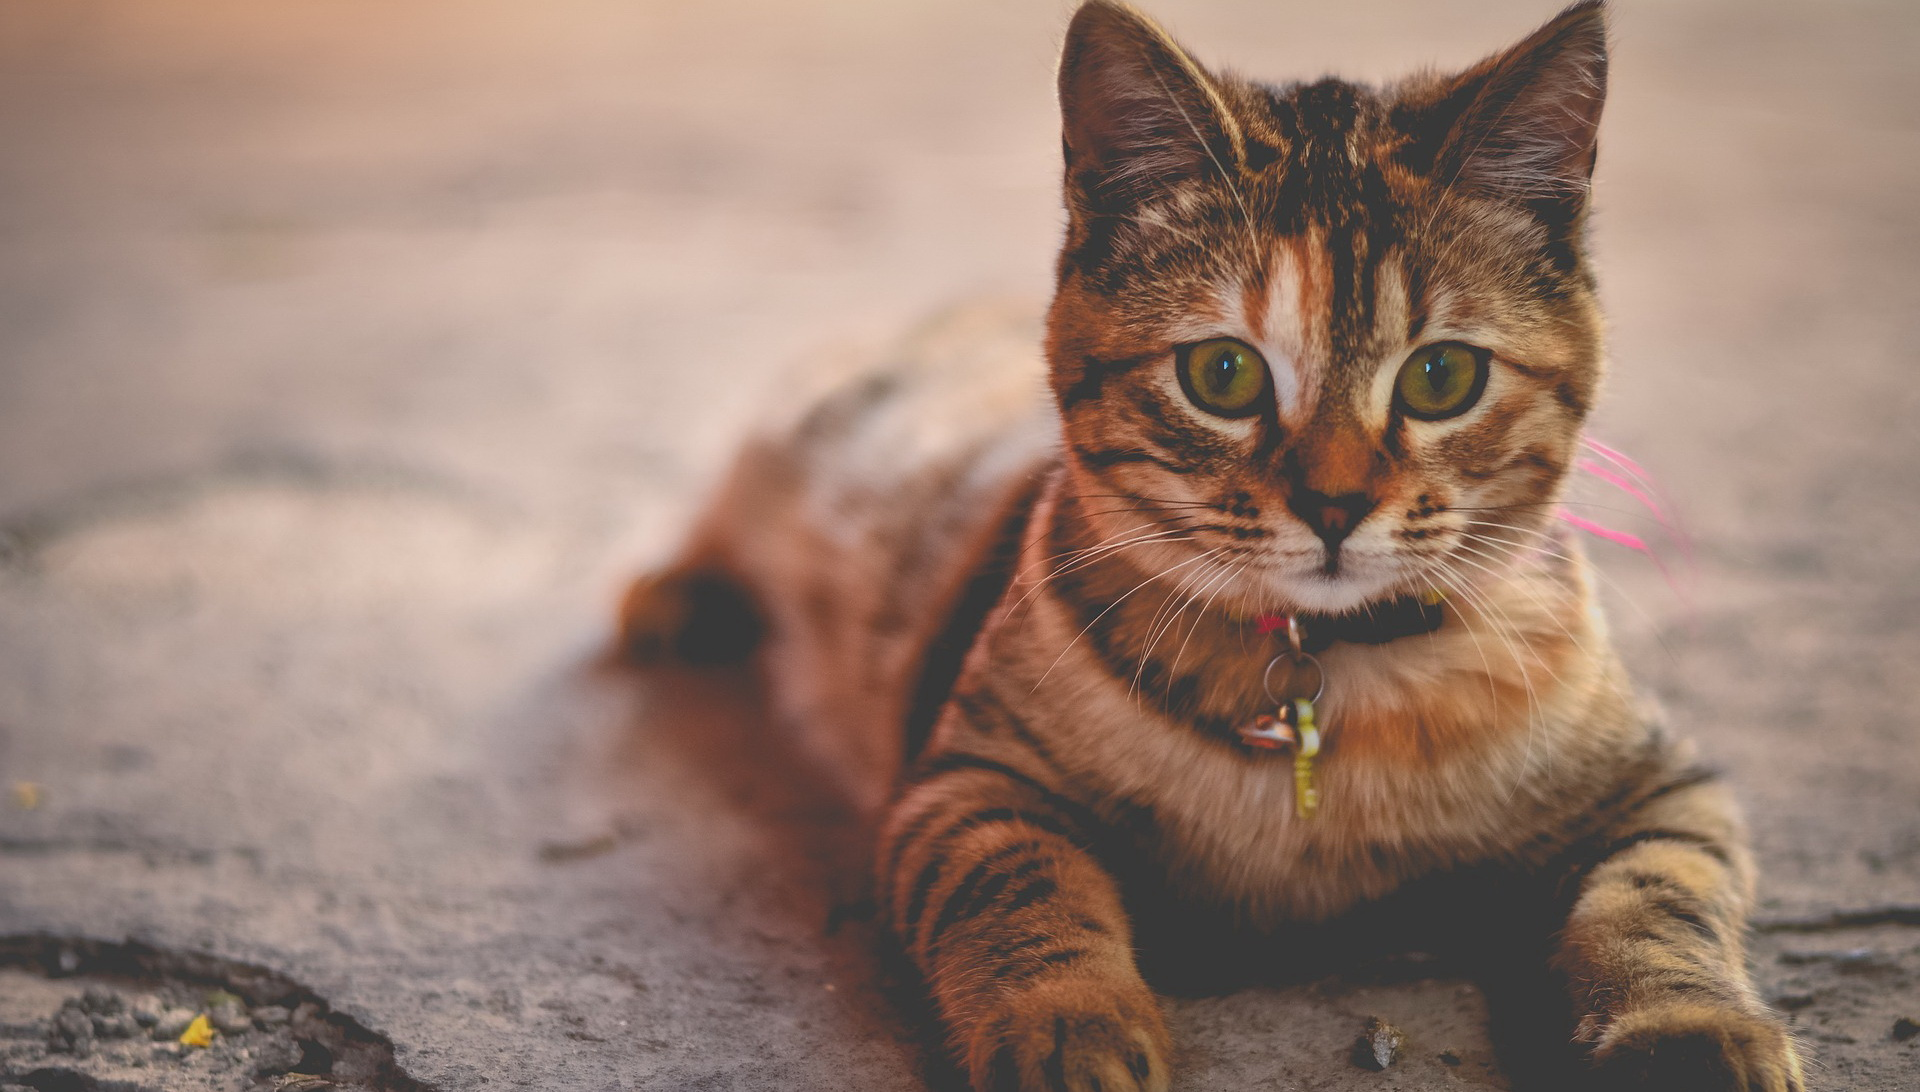 Siva mačka leži na betonu